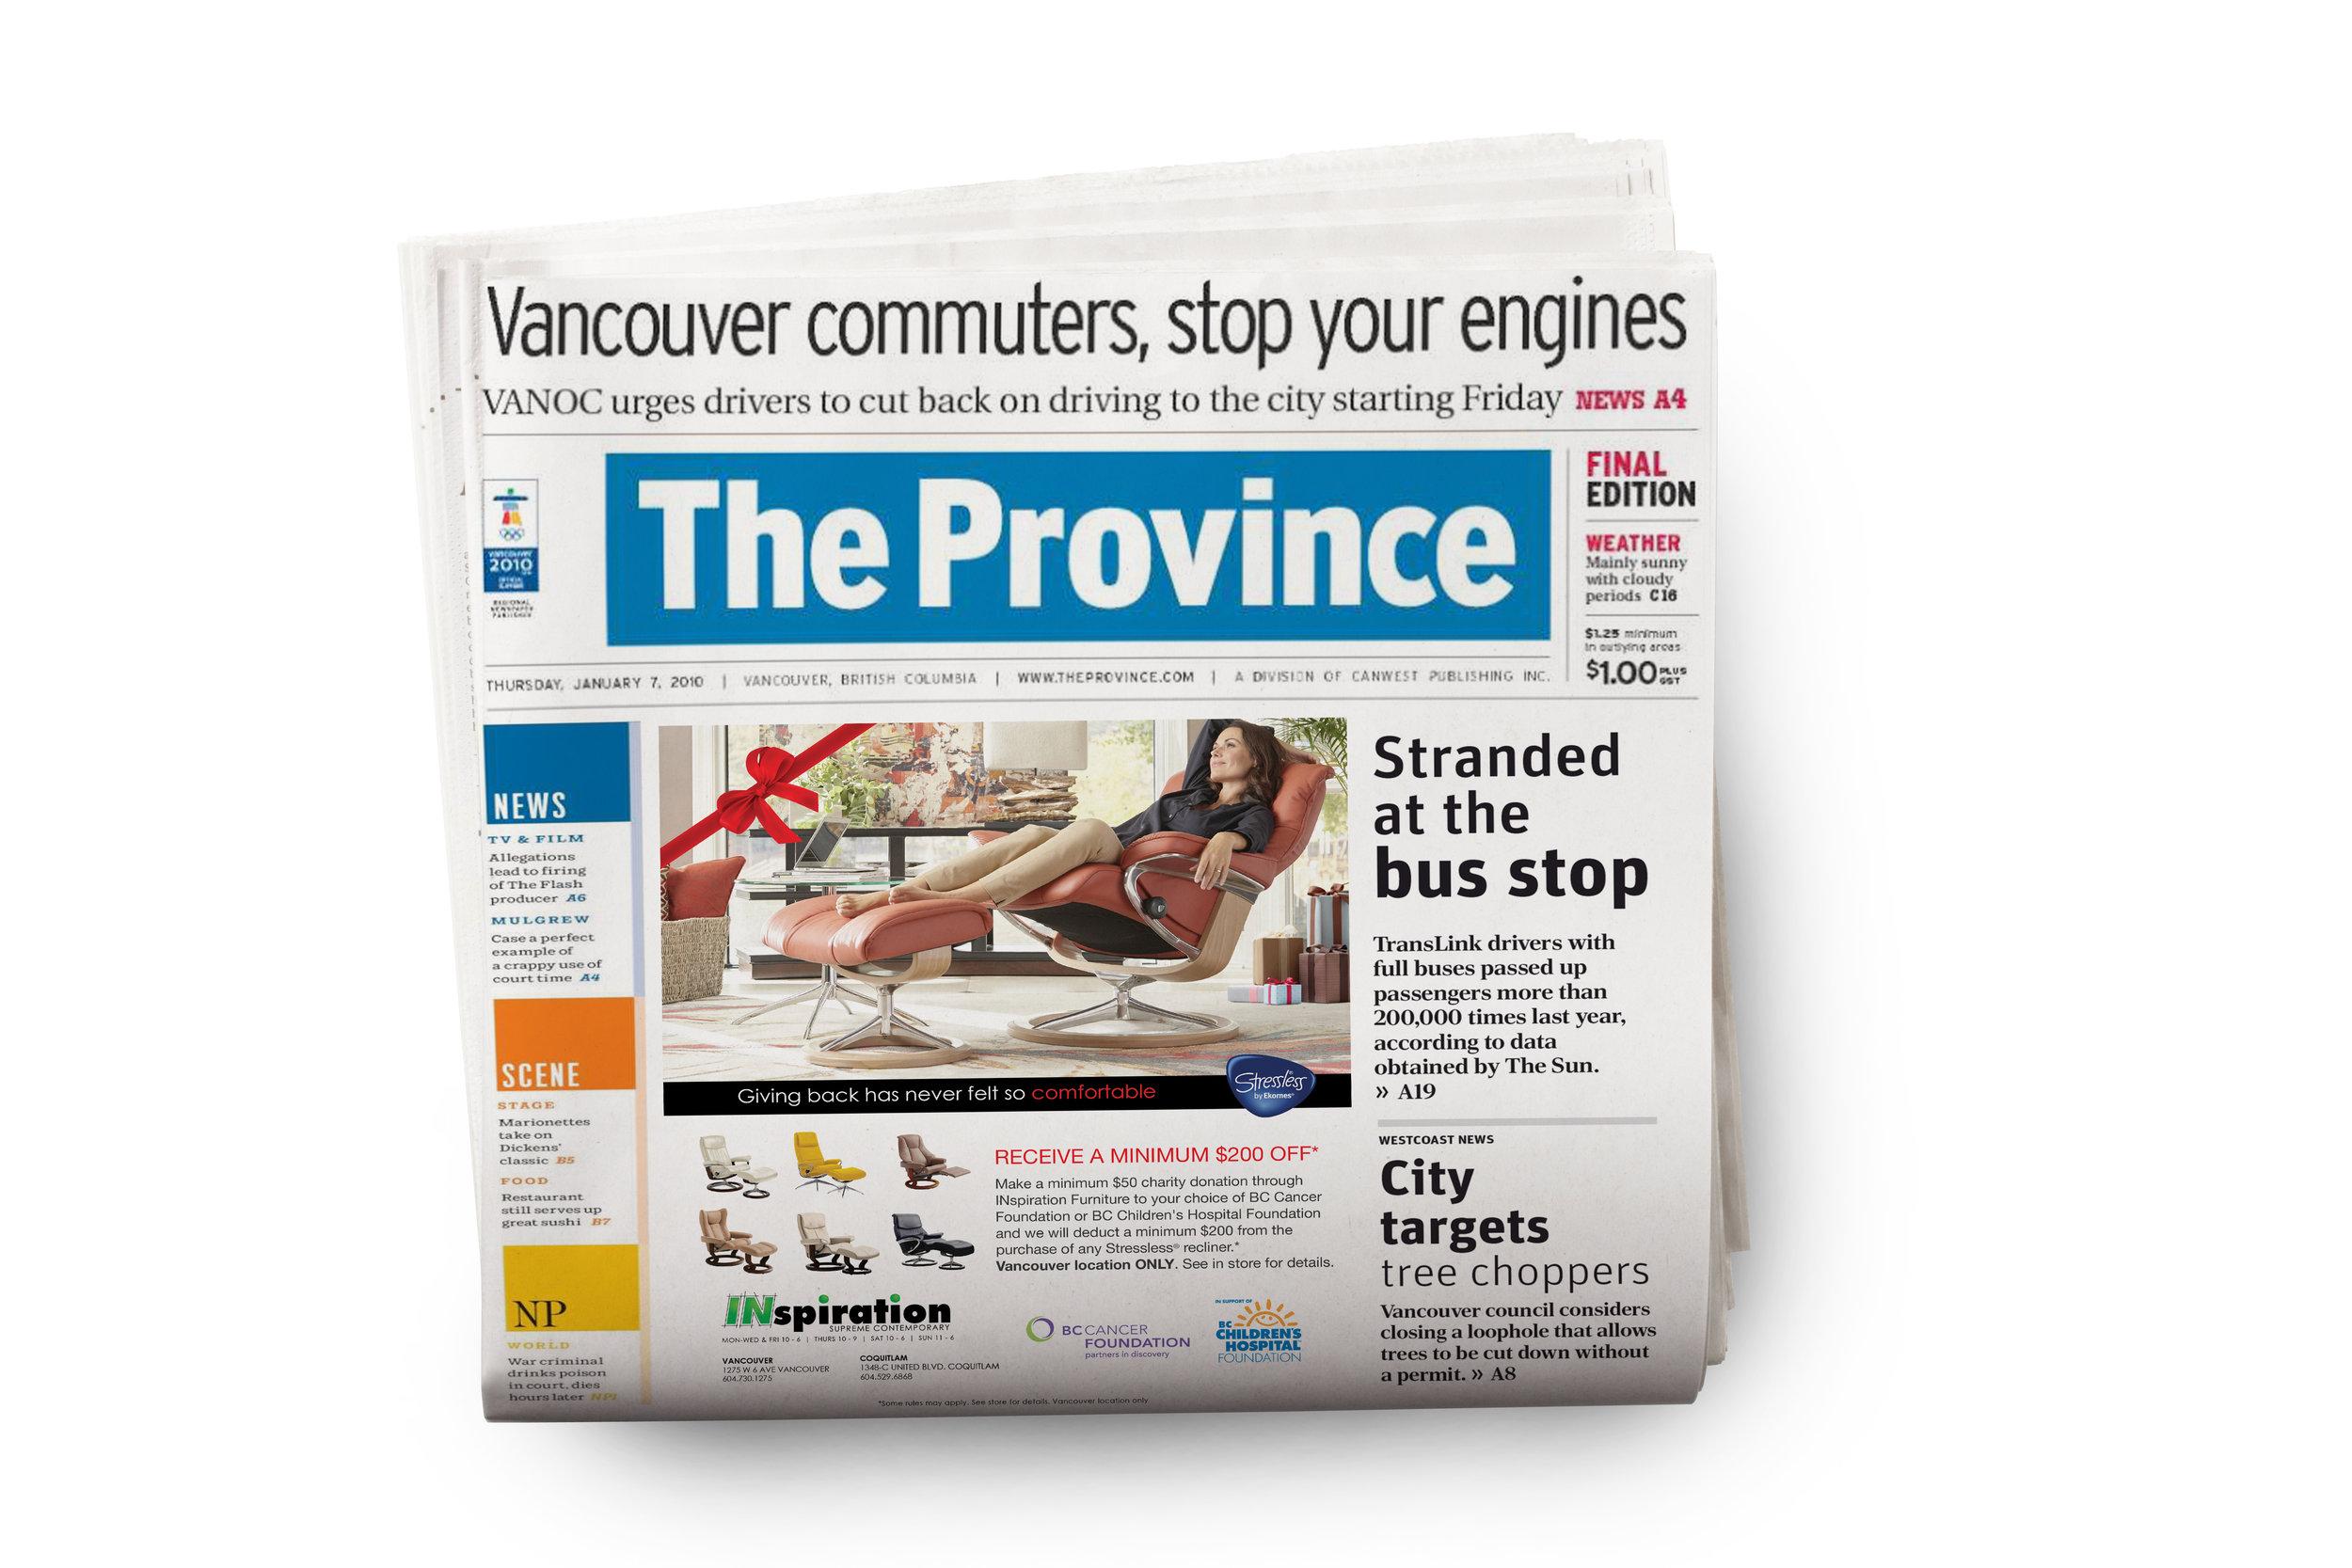 IN_Province_Newspaper28.jpg